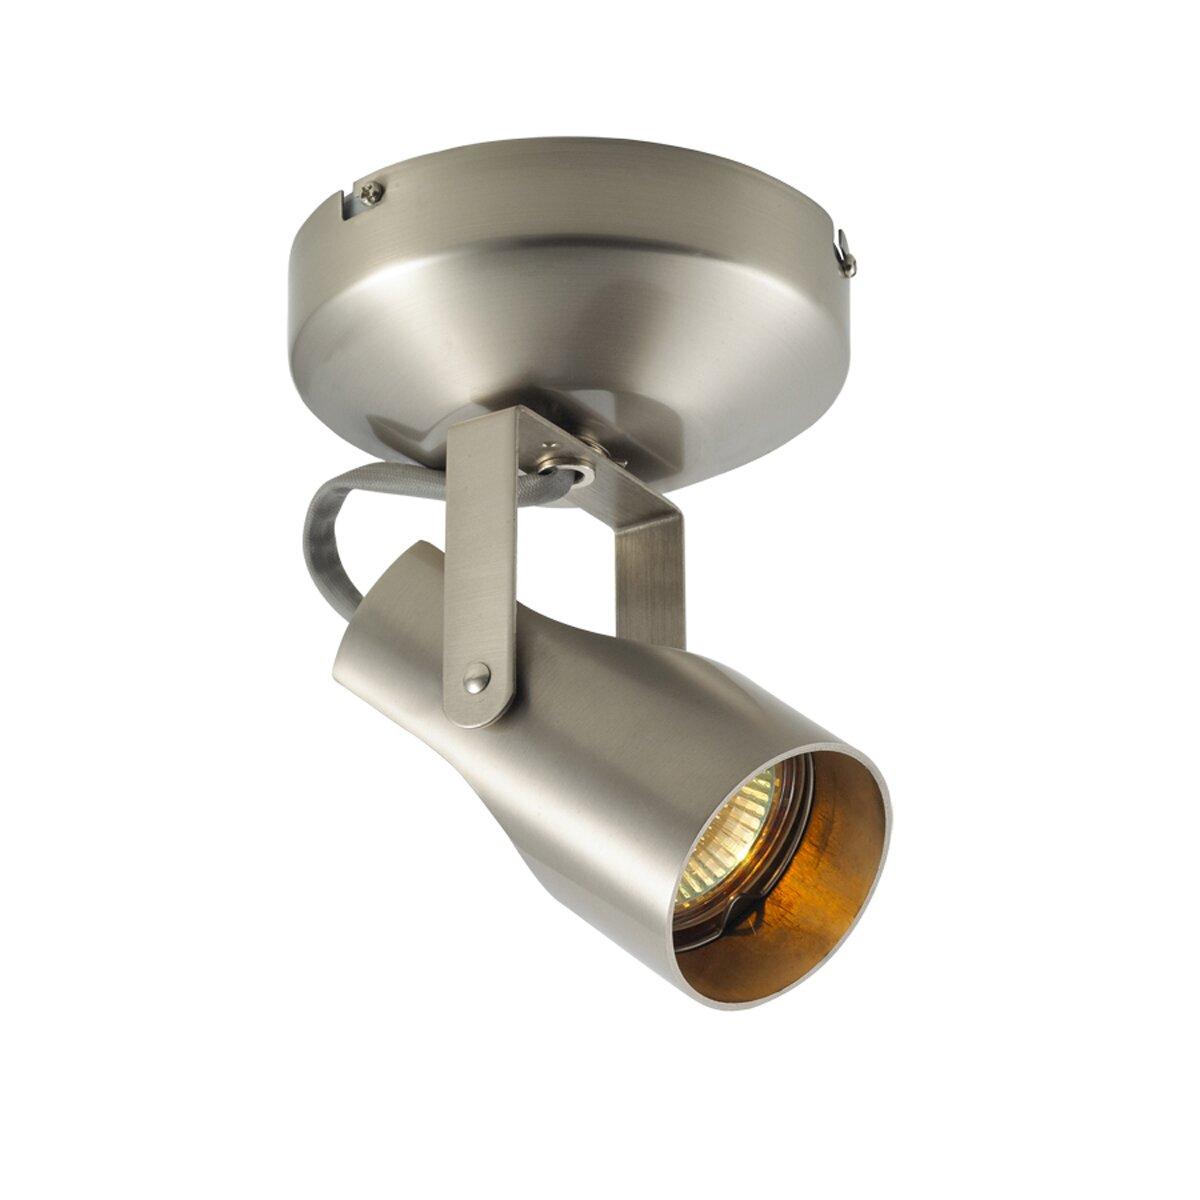 Flush Mount Low Voltage Outdoor Lighting: WAC Lighting 007 Series Low Voltage Semi Flush Mount Spot